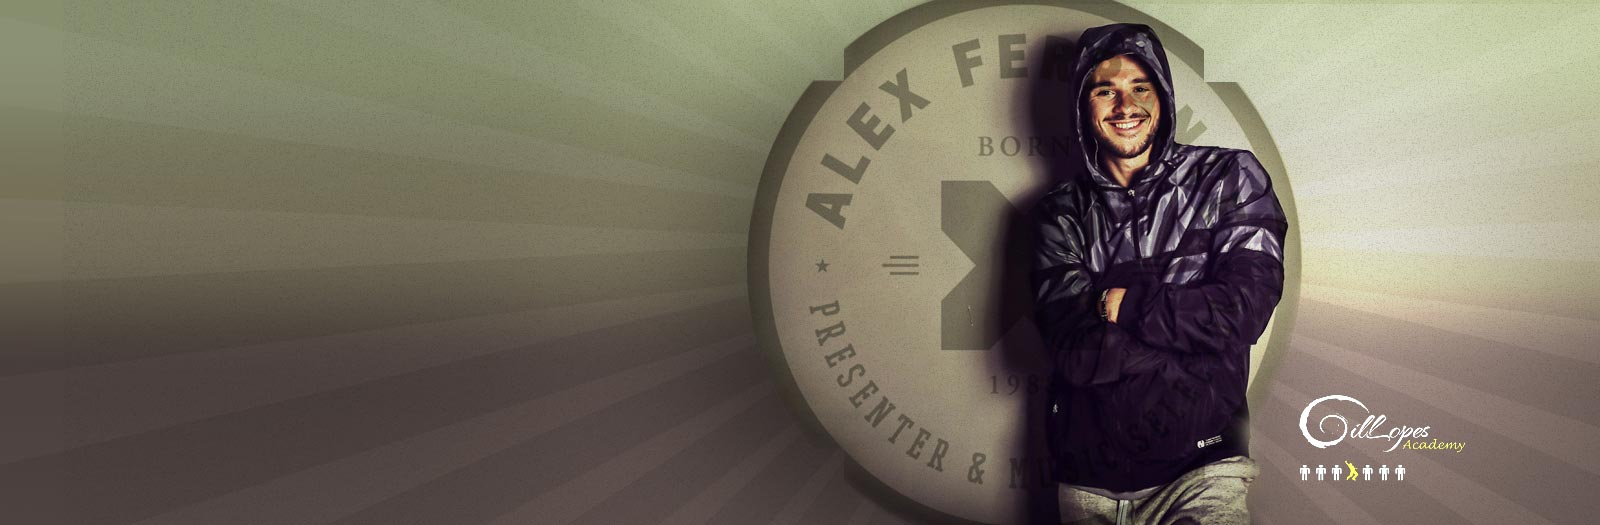 alex-ferrante-slide